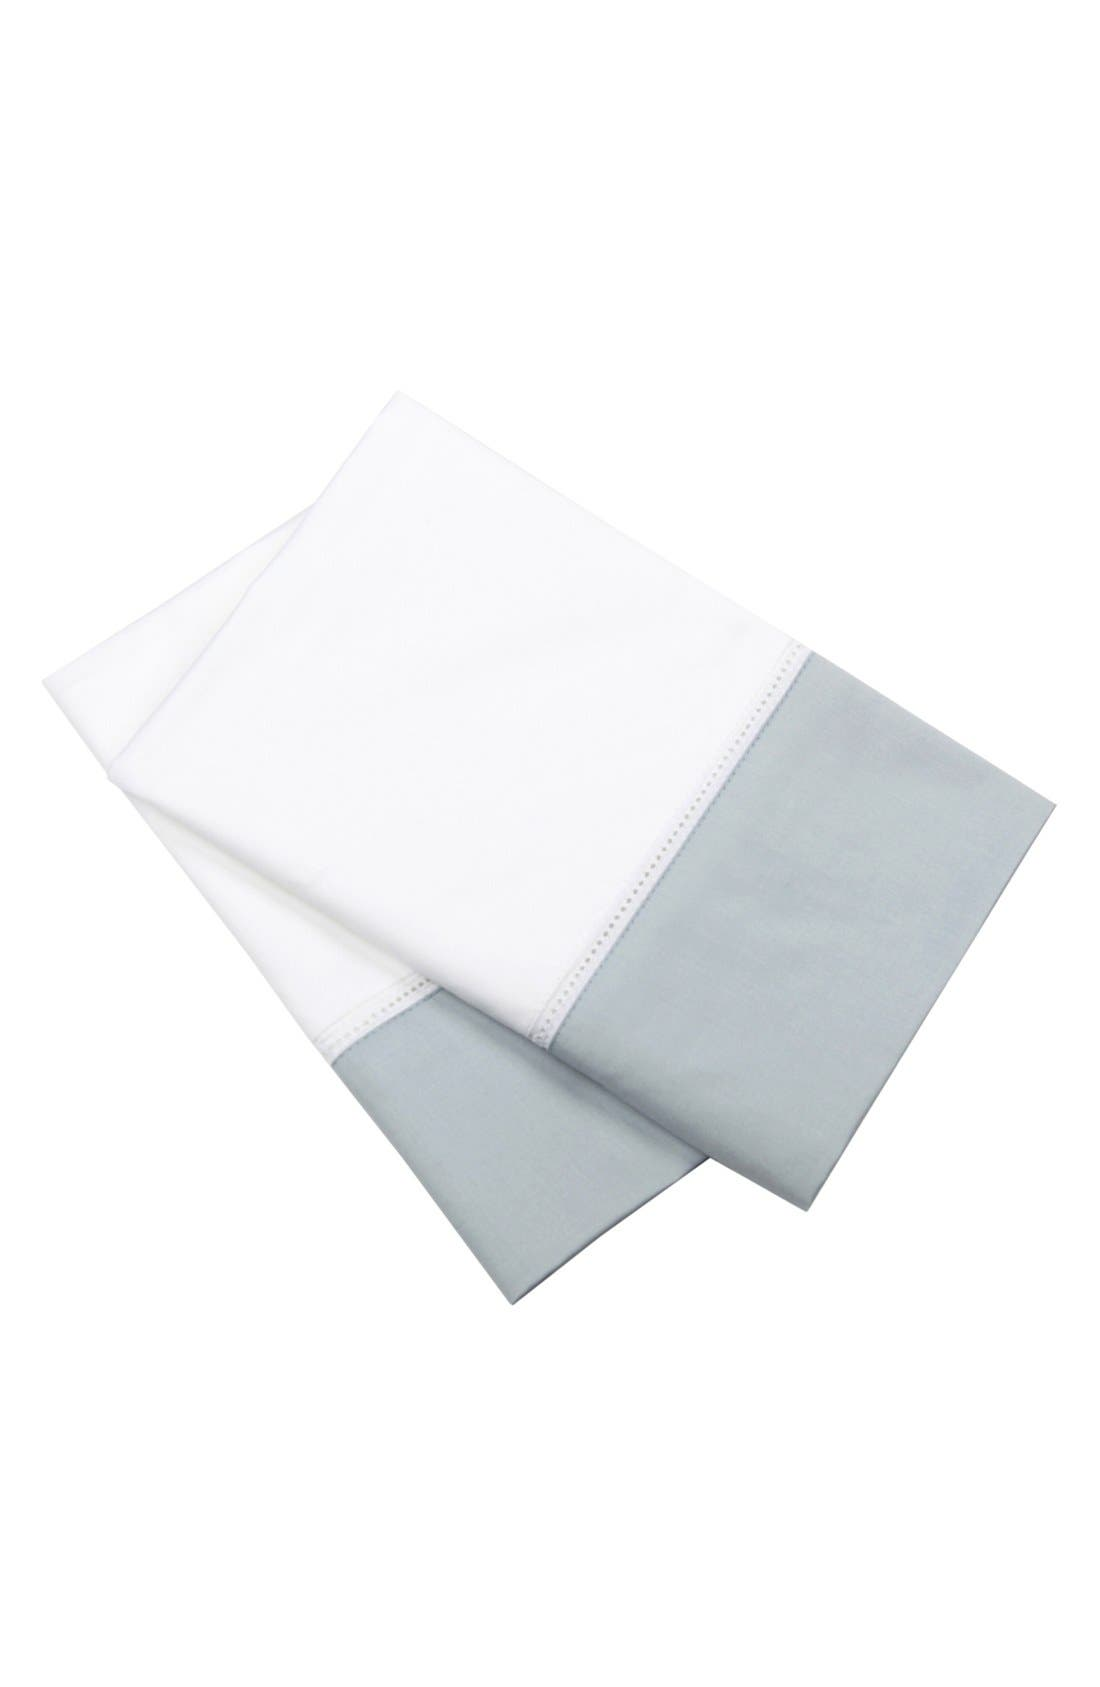 Main Image - Blissliving Home 'Mayfair White' Cotton Sateen Standard Pillowcase